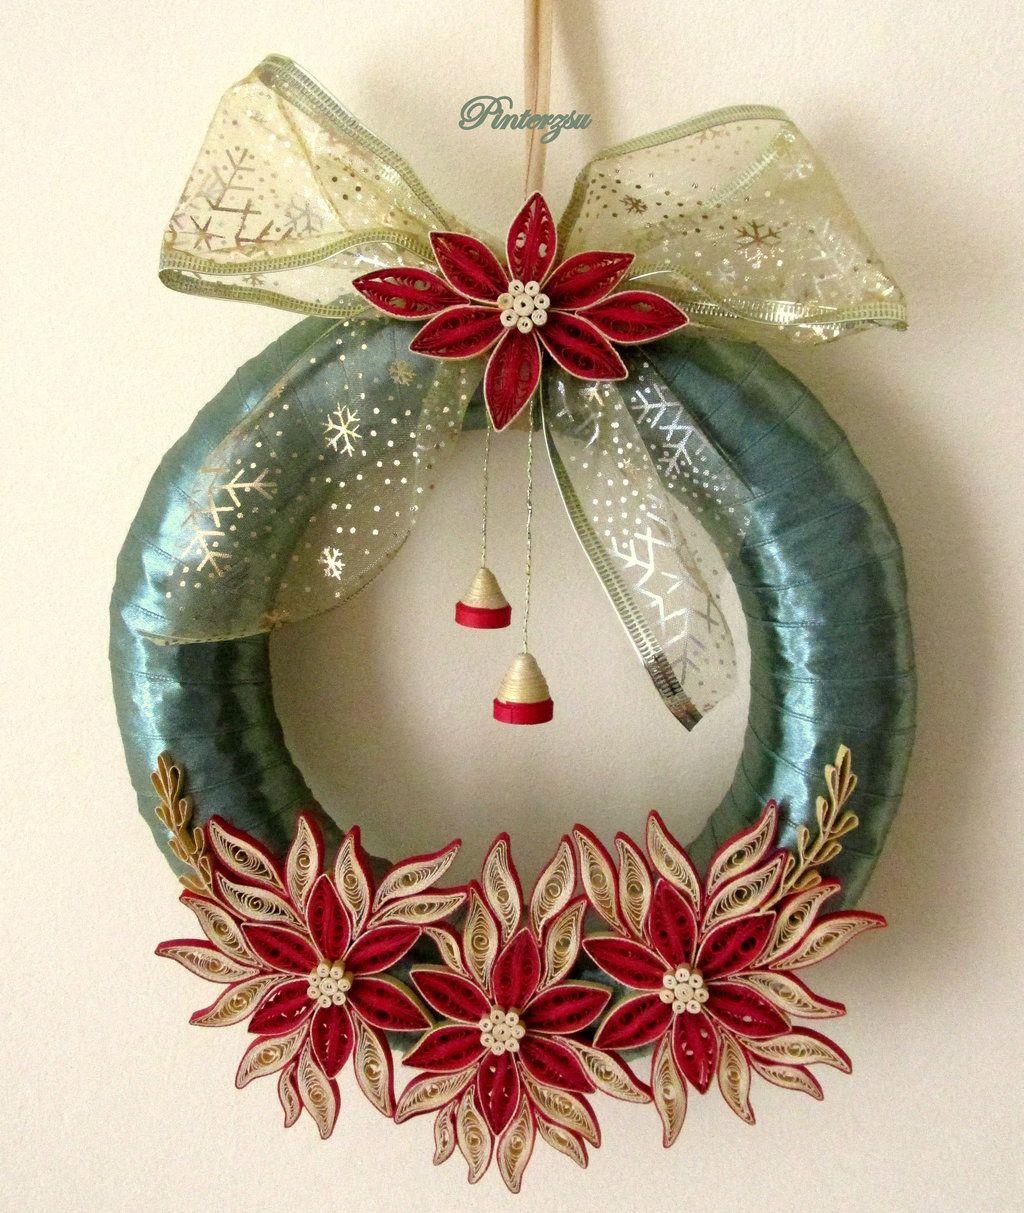 Christmas Wreath By Pinterzsu Deviantart Com On Deviantart Dekorasyon Fikirleri Sus Fikirler